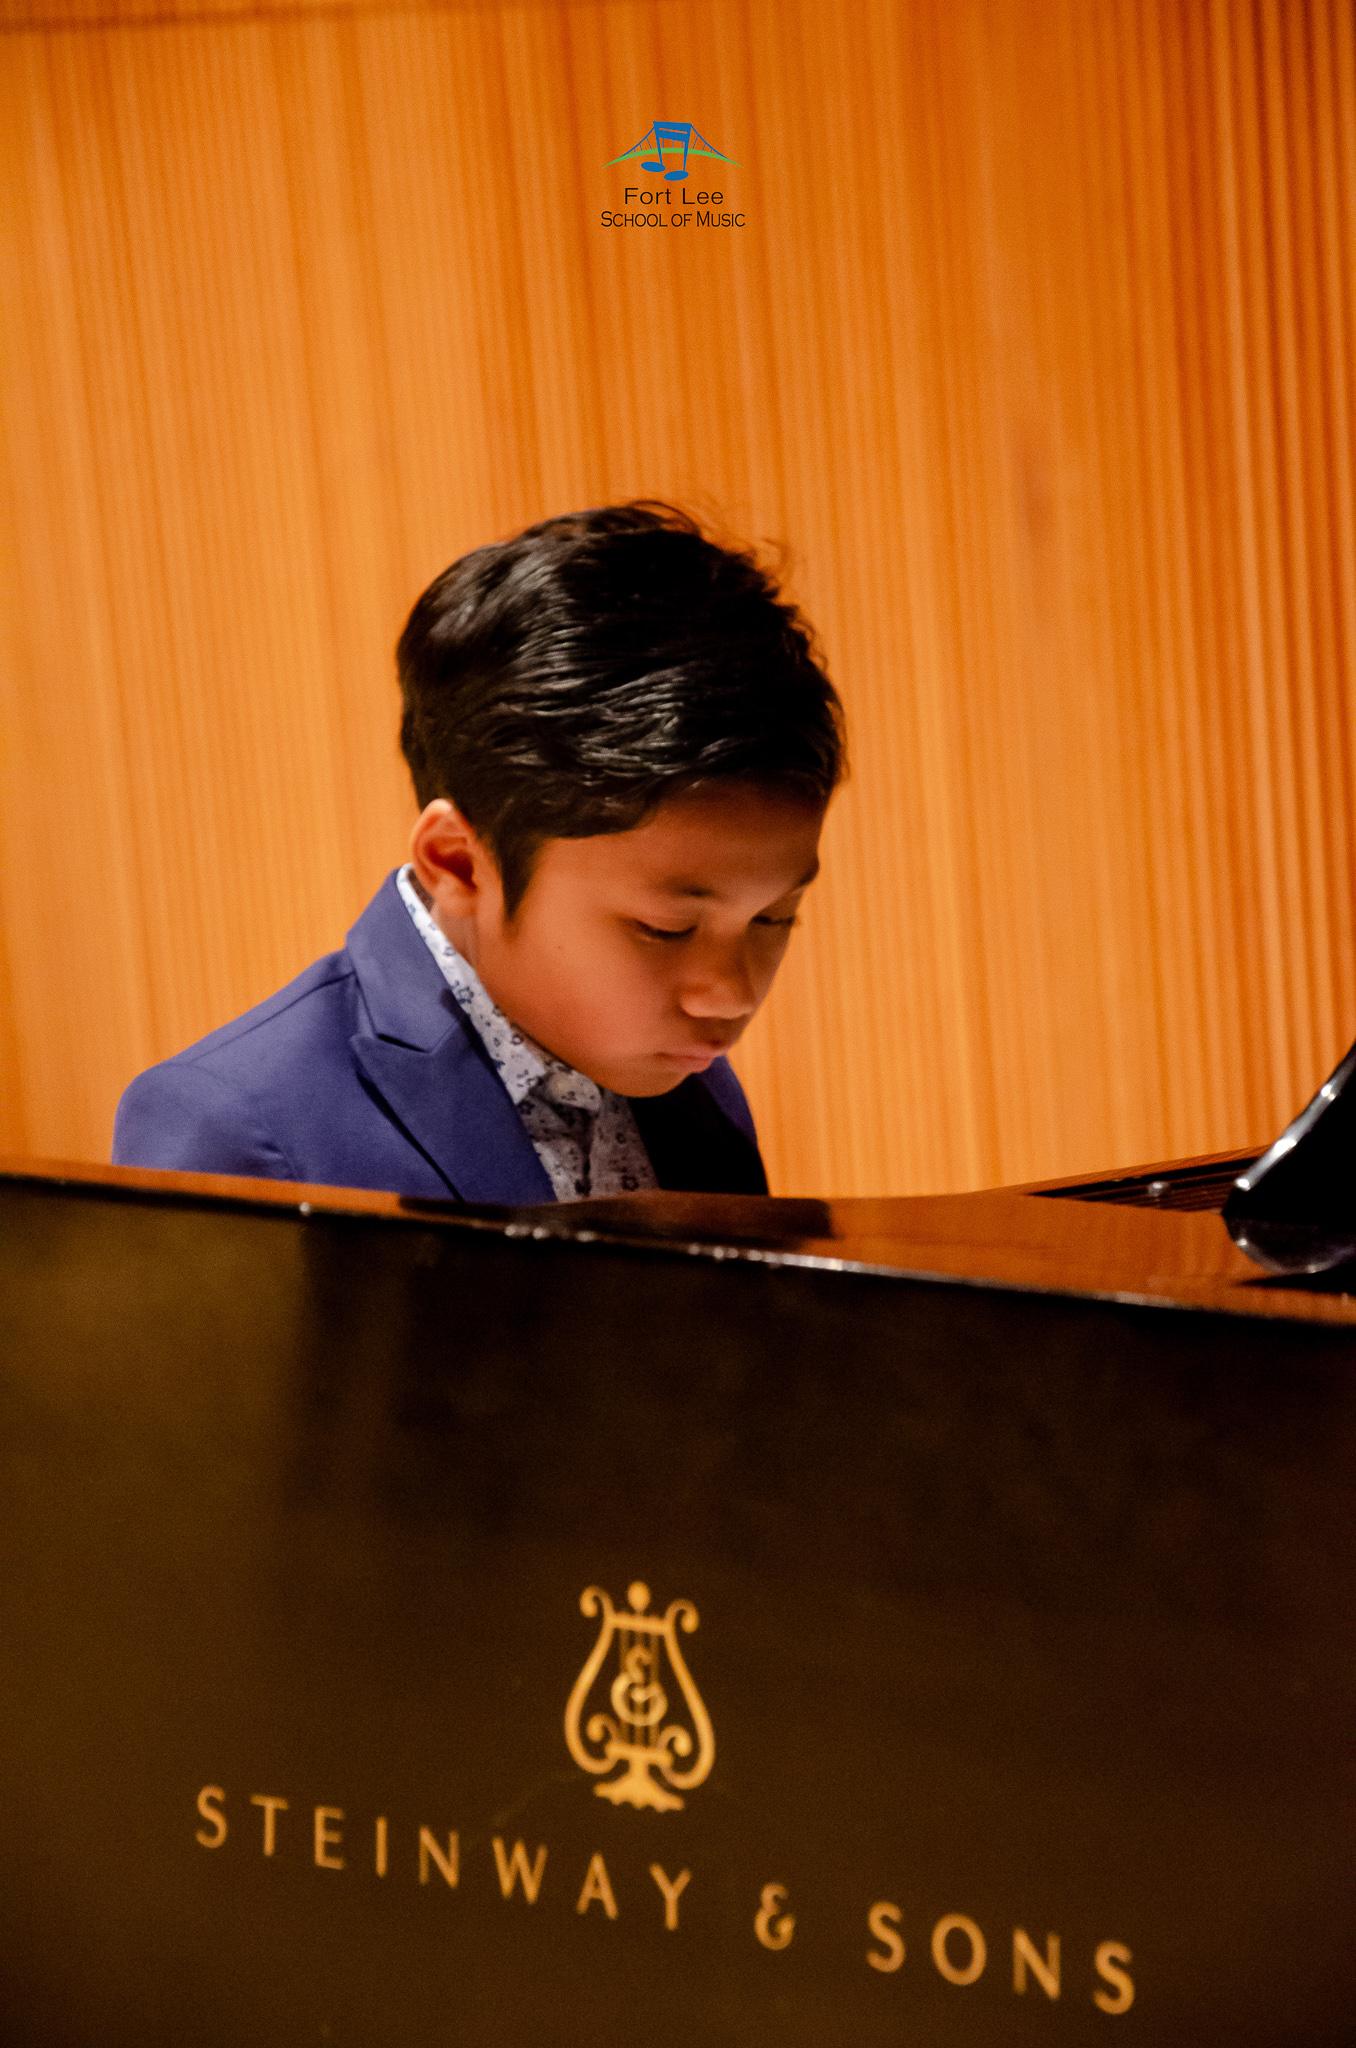 piano-schools-near-me.jpg